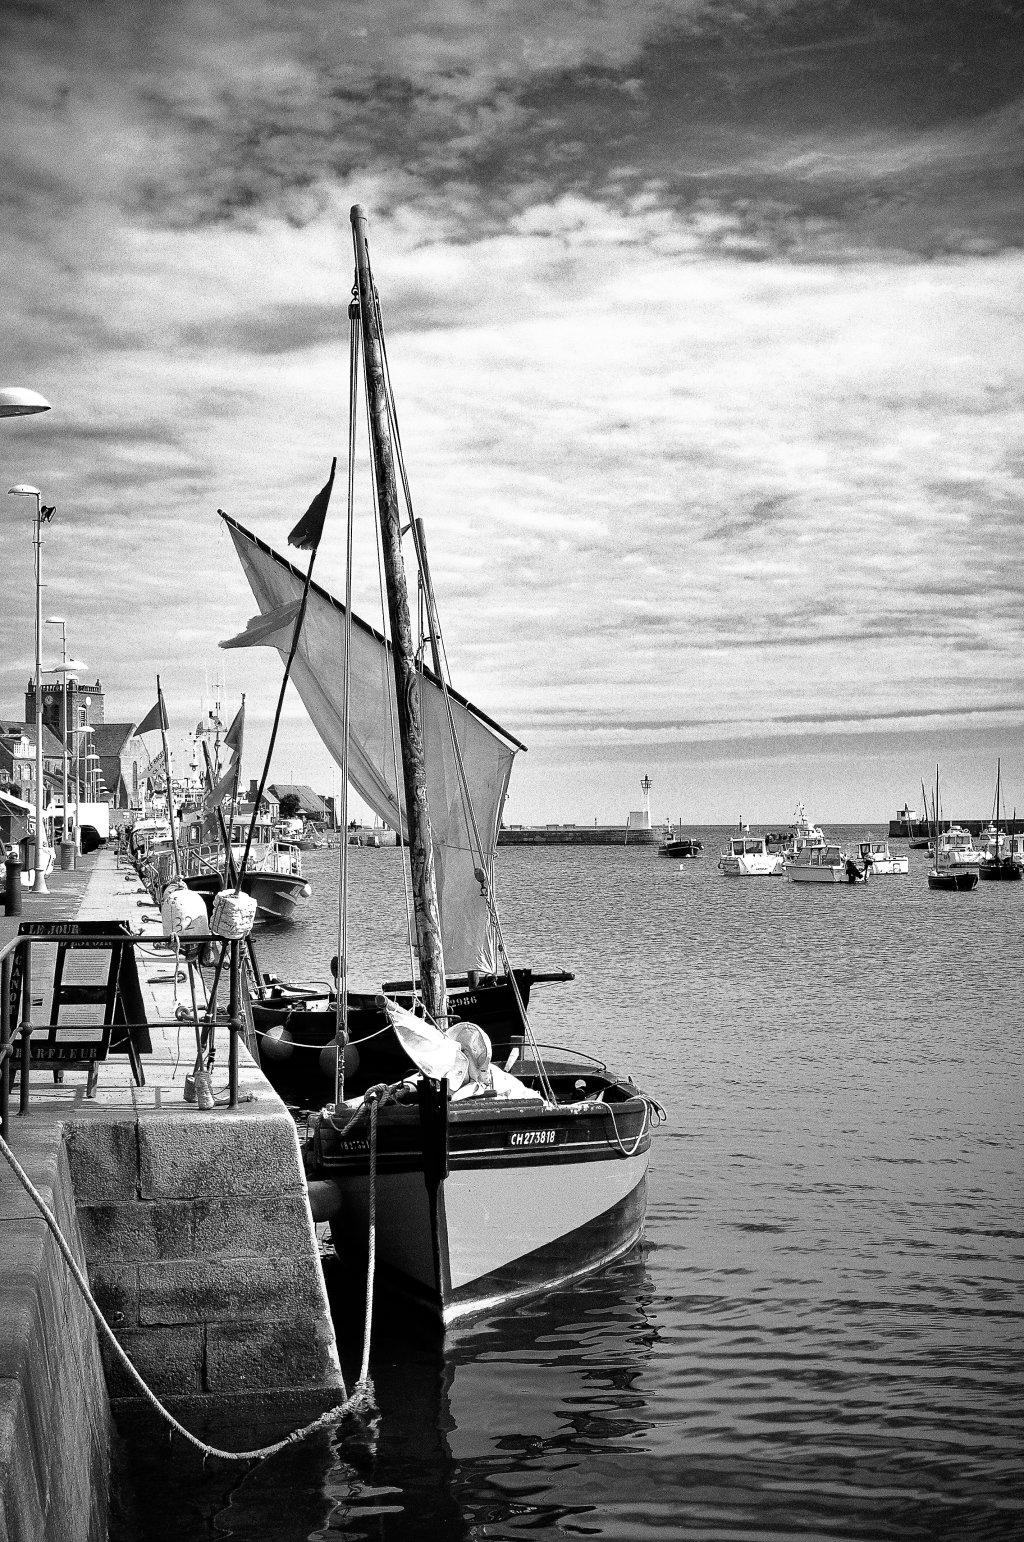 Boat at Barfleur